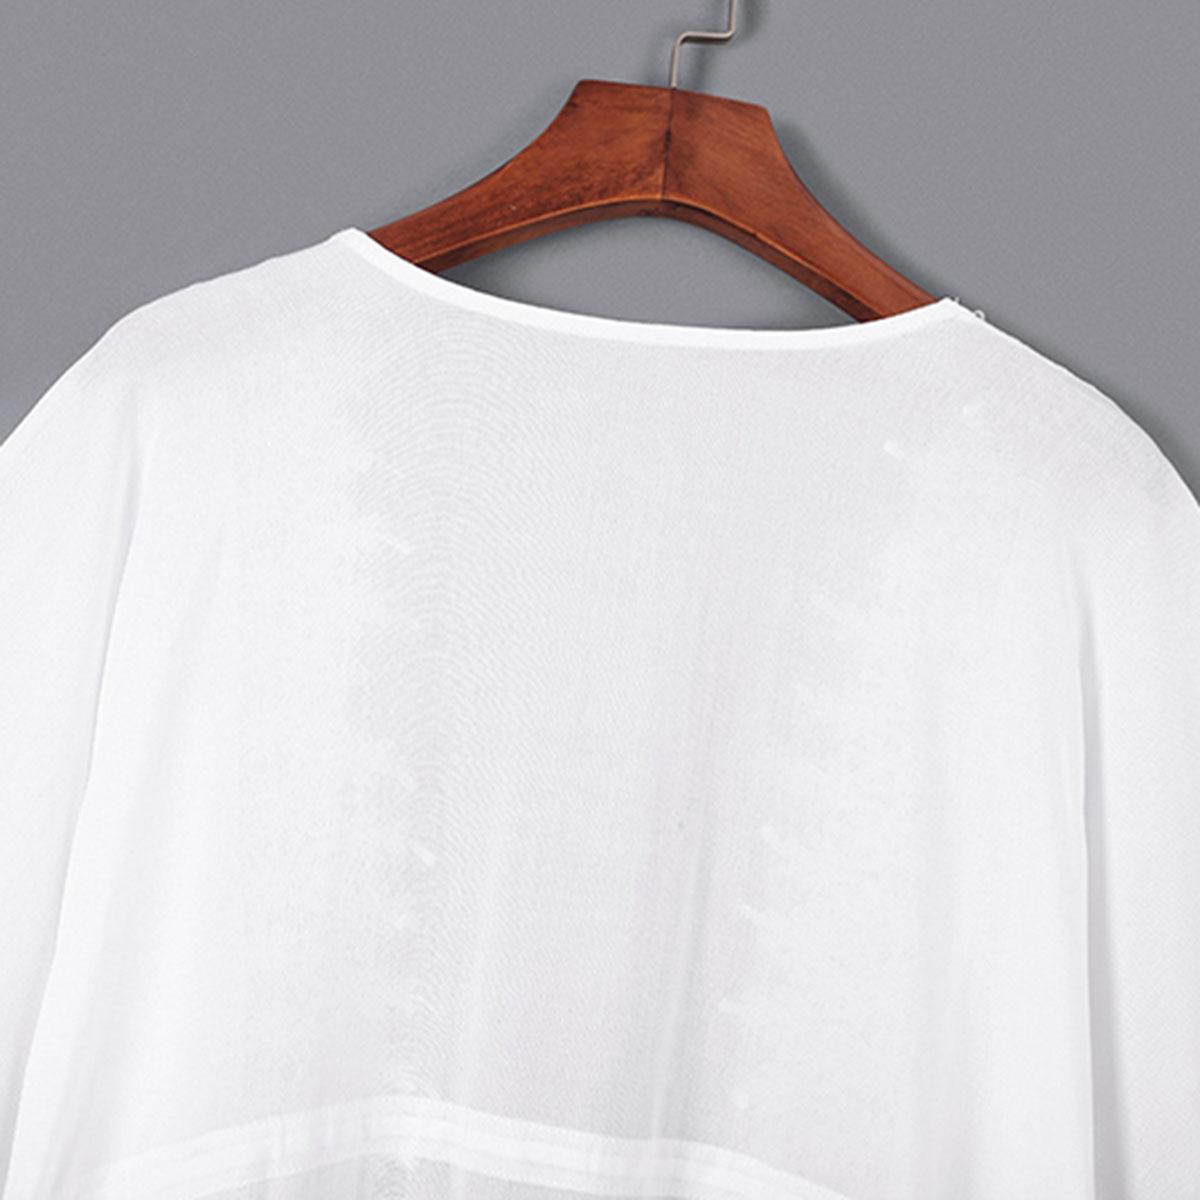 sommar bomull hakig cardigan blus 9070129ef7aee